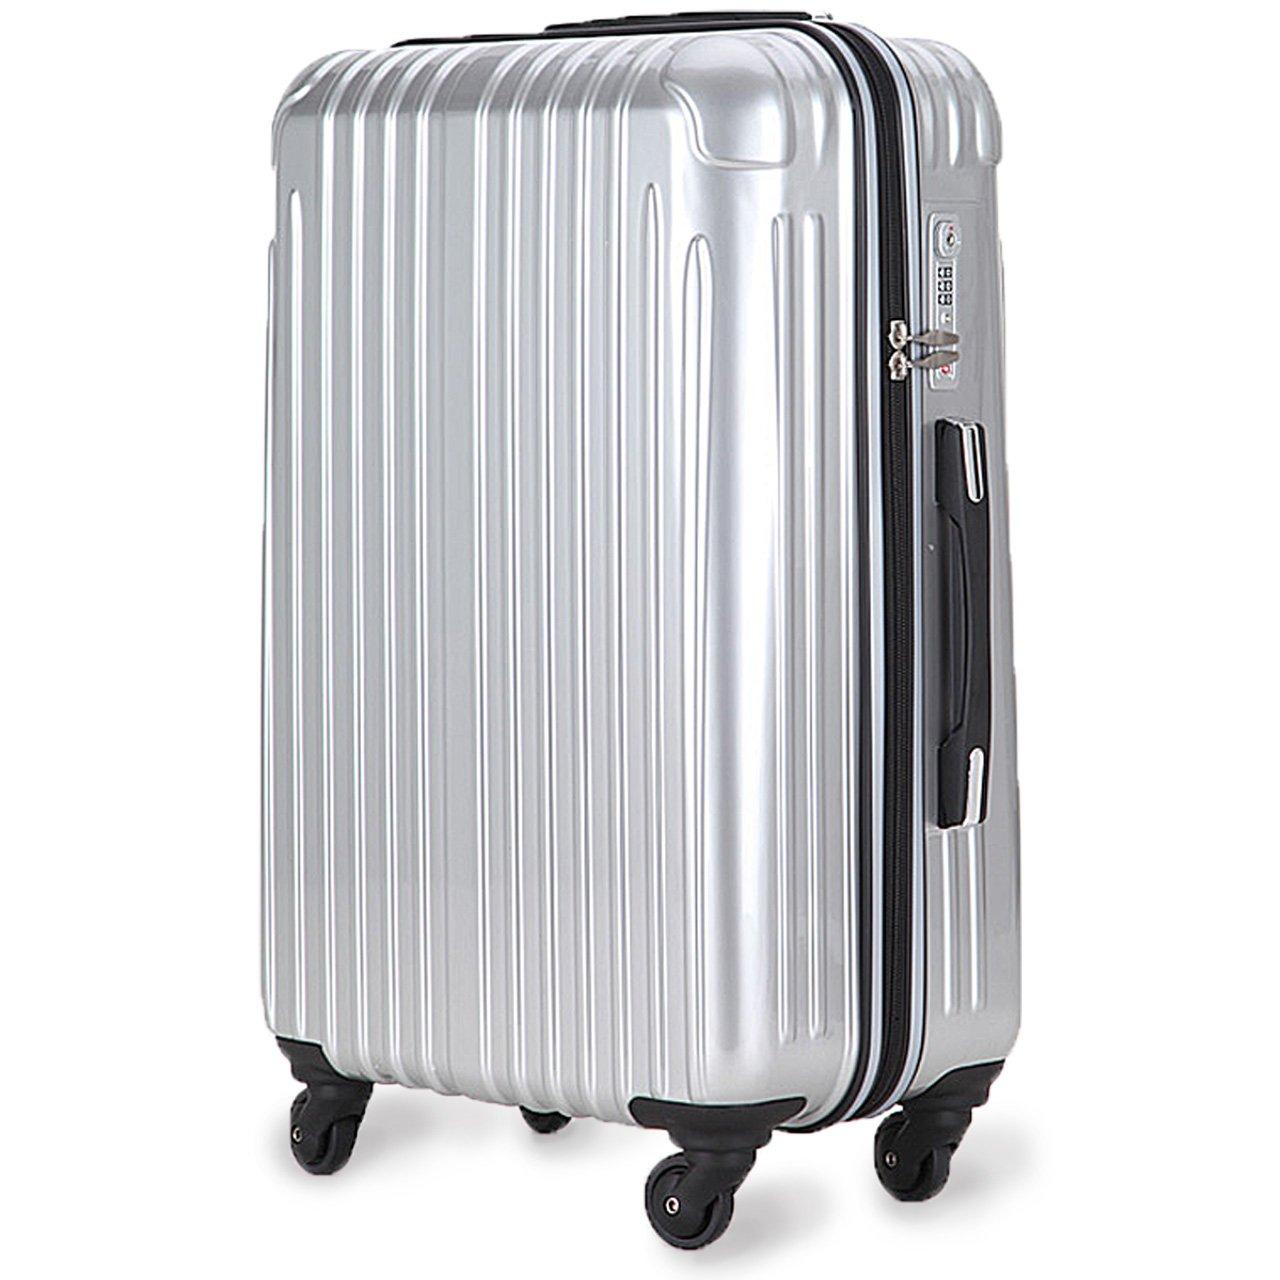 strike[ストライク]超軽量 2年保証 スーツケース TSAロック搭載 旅行バック トランクケース 旅行カバン B07586YW7J 大型アウトレット|シルバー シルバー 大型アウトレット